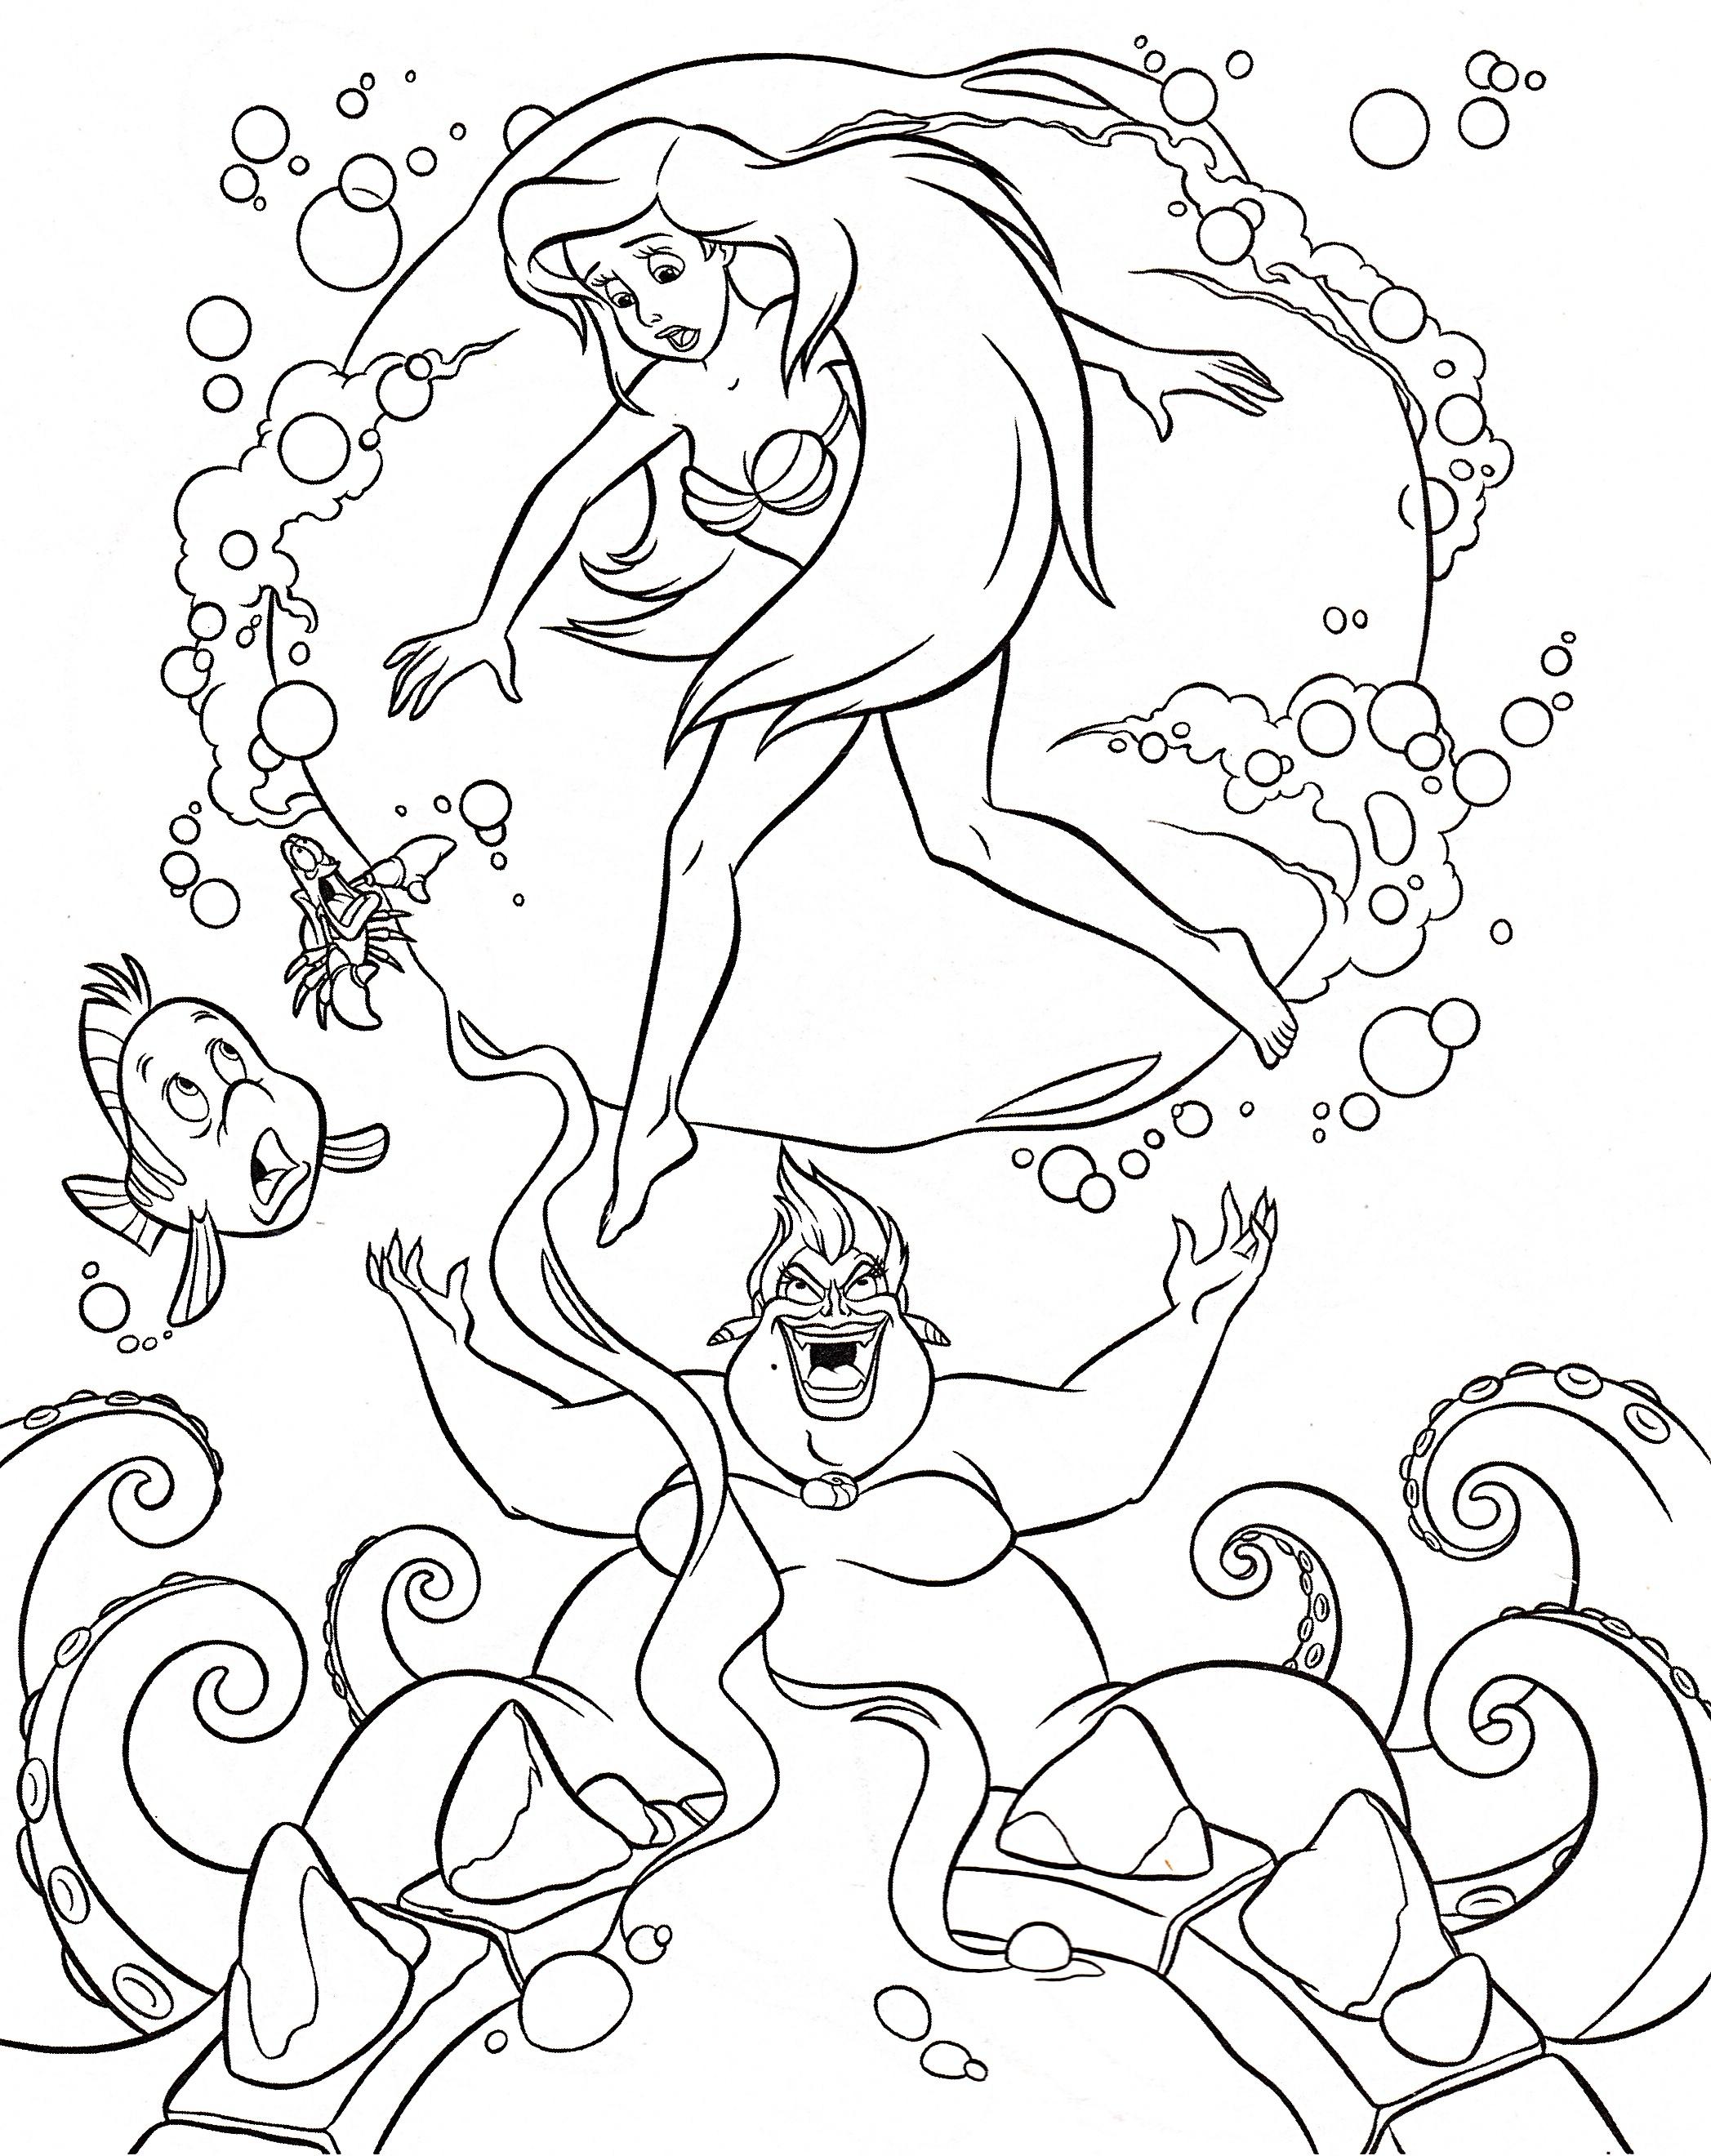 - Disney Princess Adult Coloring Pages At GetDrawings Free Download